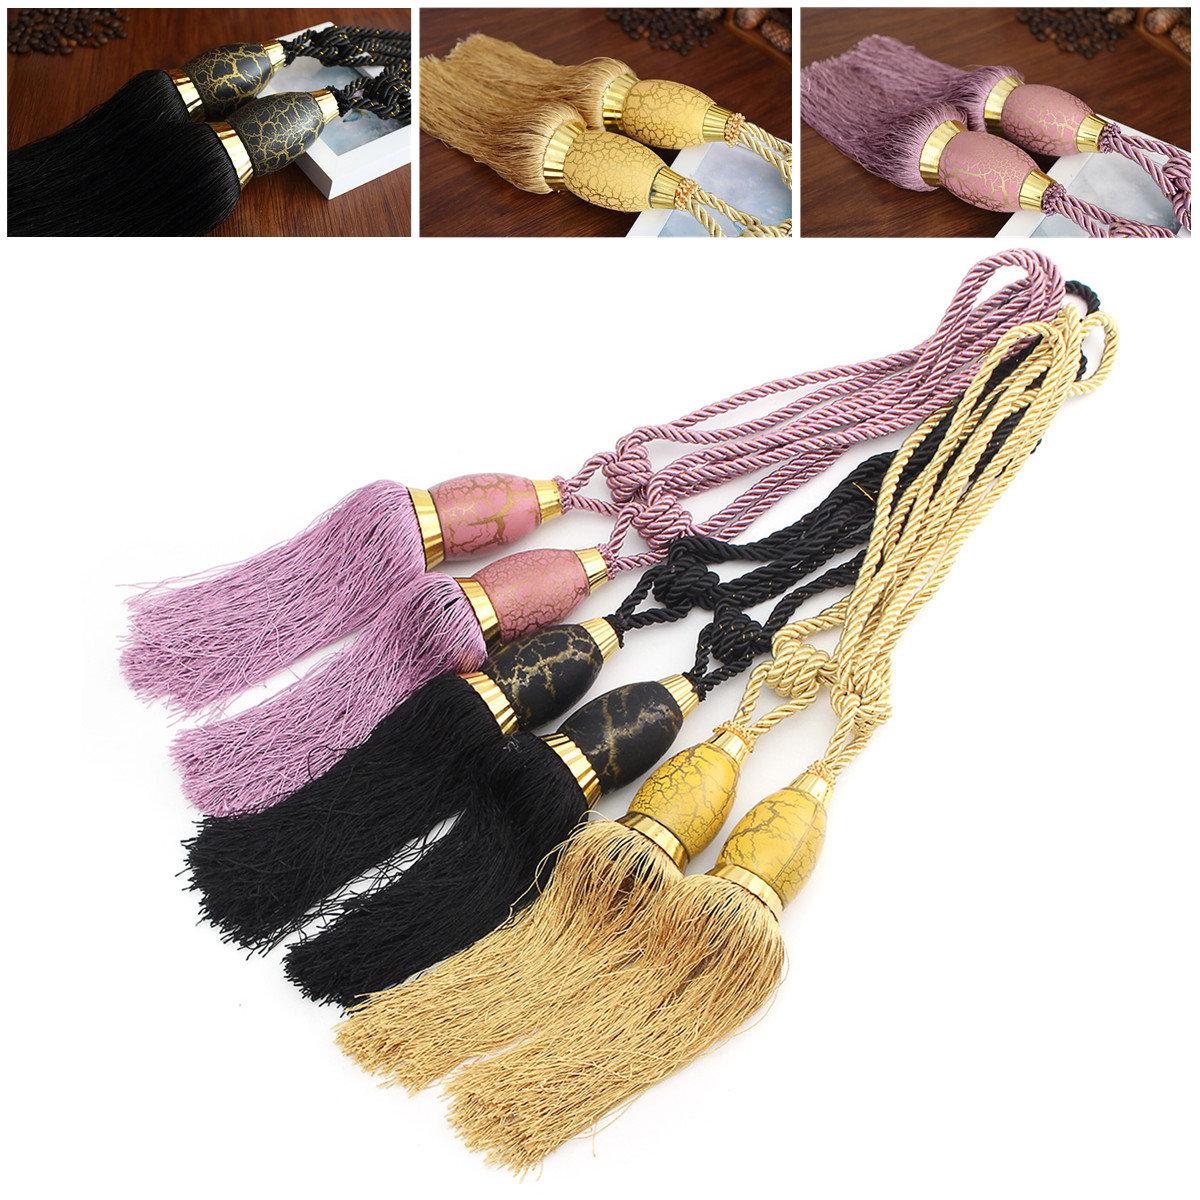 2Pcs Tassel Rope ผ้าม่านหน้าต่าง Tiebacks Buckles Tie แขวน Holdback จี้